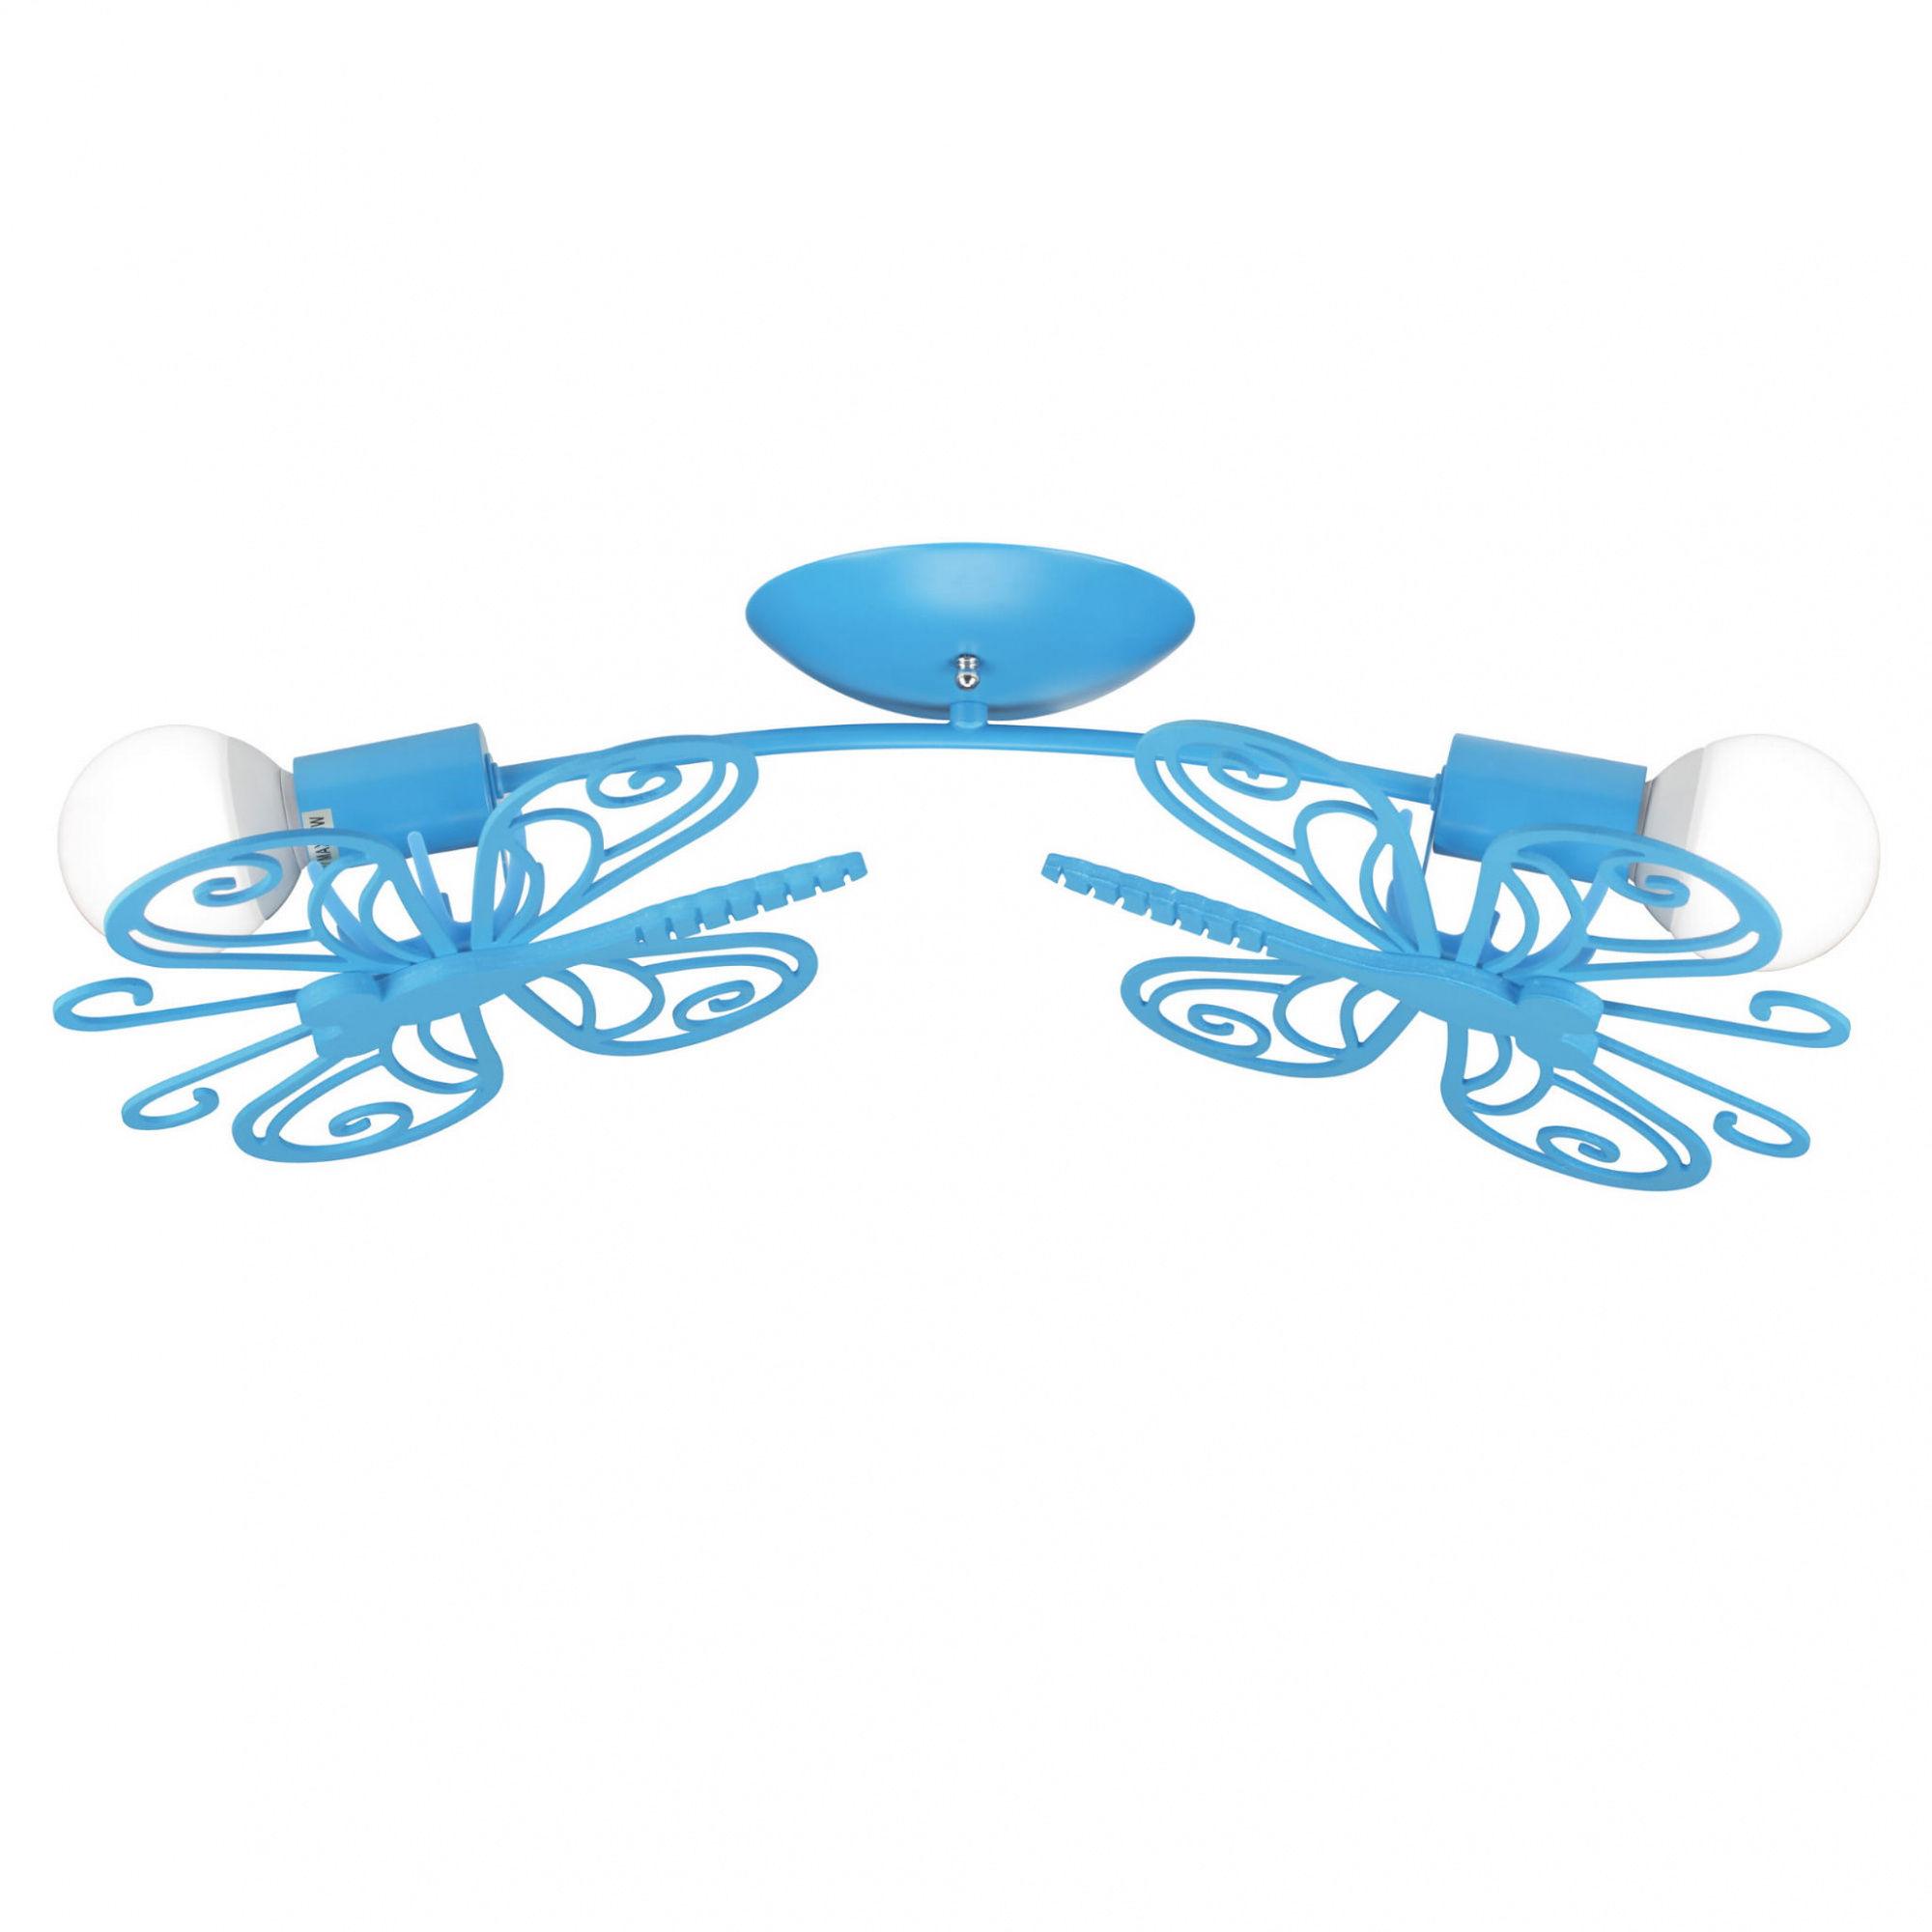 Plafon Motylek 2 LP-14031/2C Light Prestige niebieska lampa sufitowa z motylkami